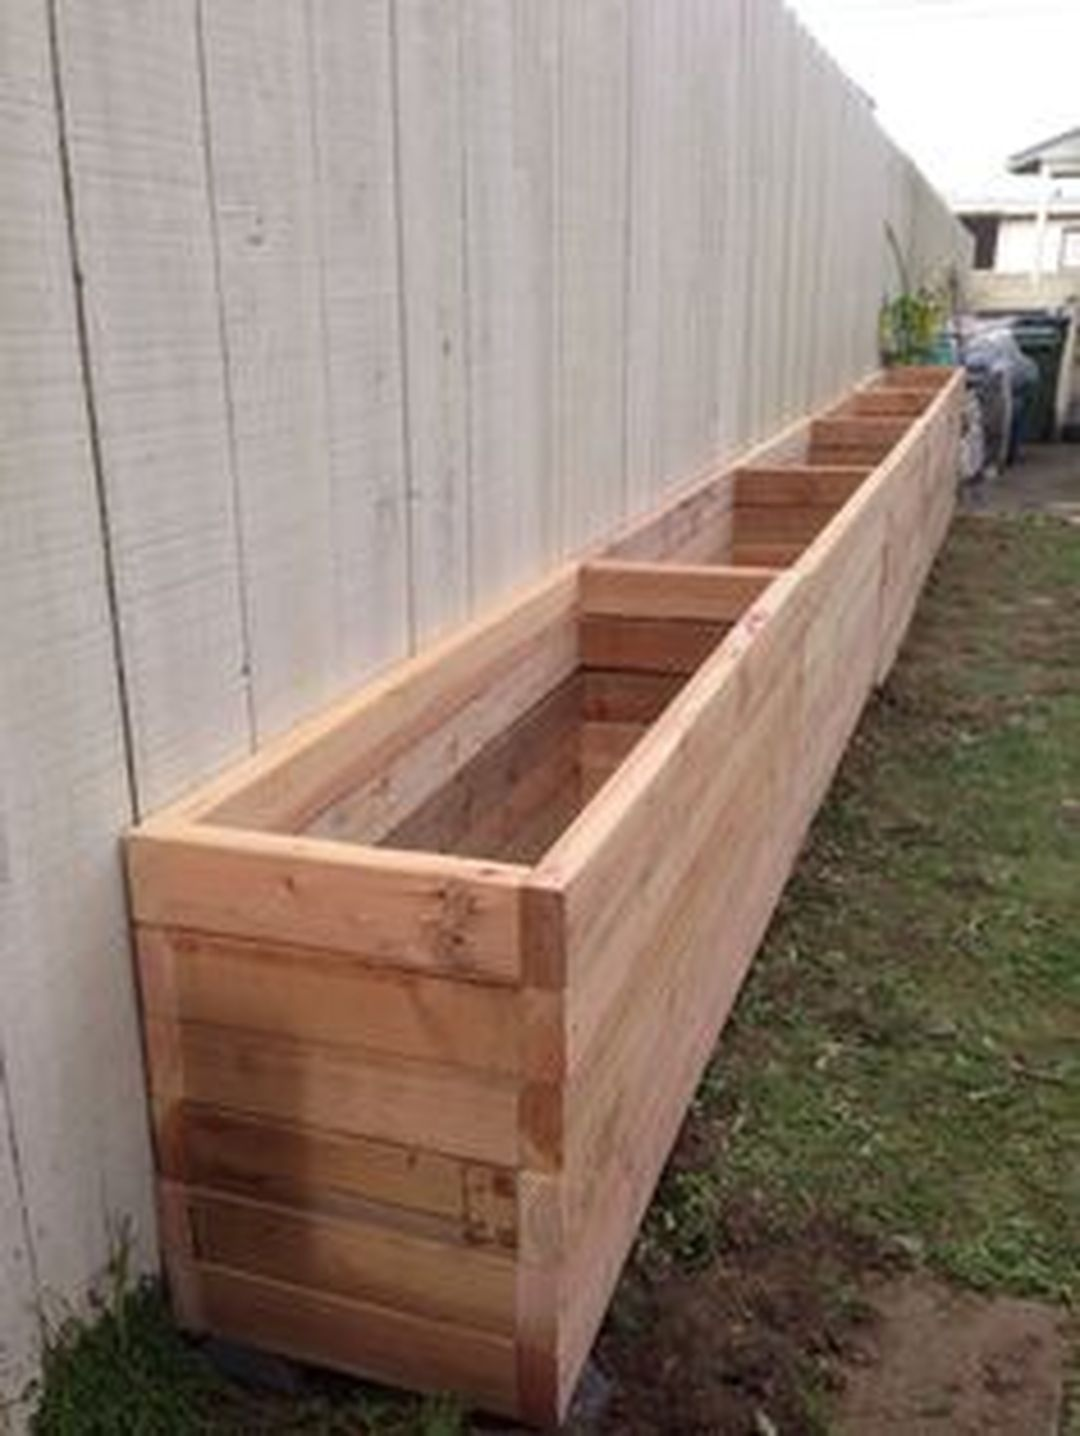 18 Amazing DIY Raised Garden Beds Ideas | Raising, Gardens and ...